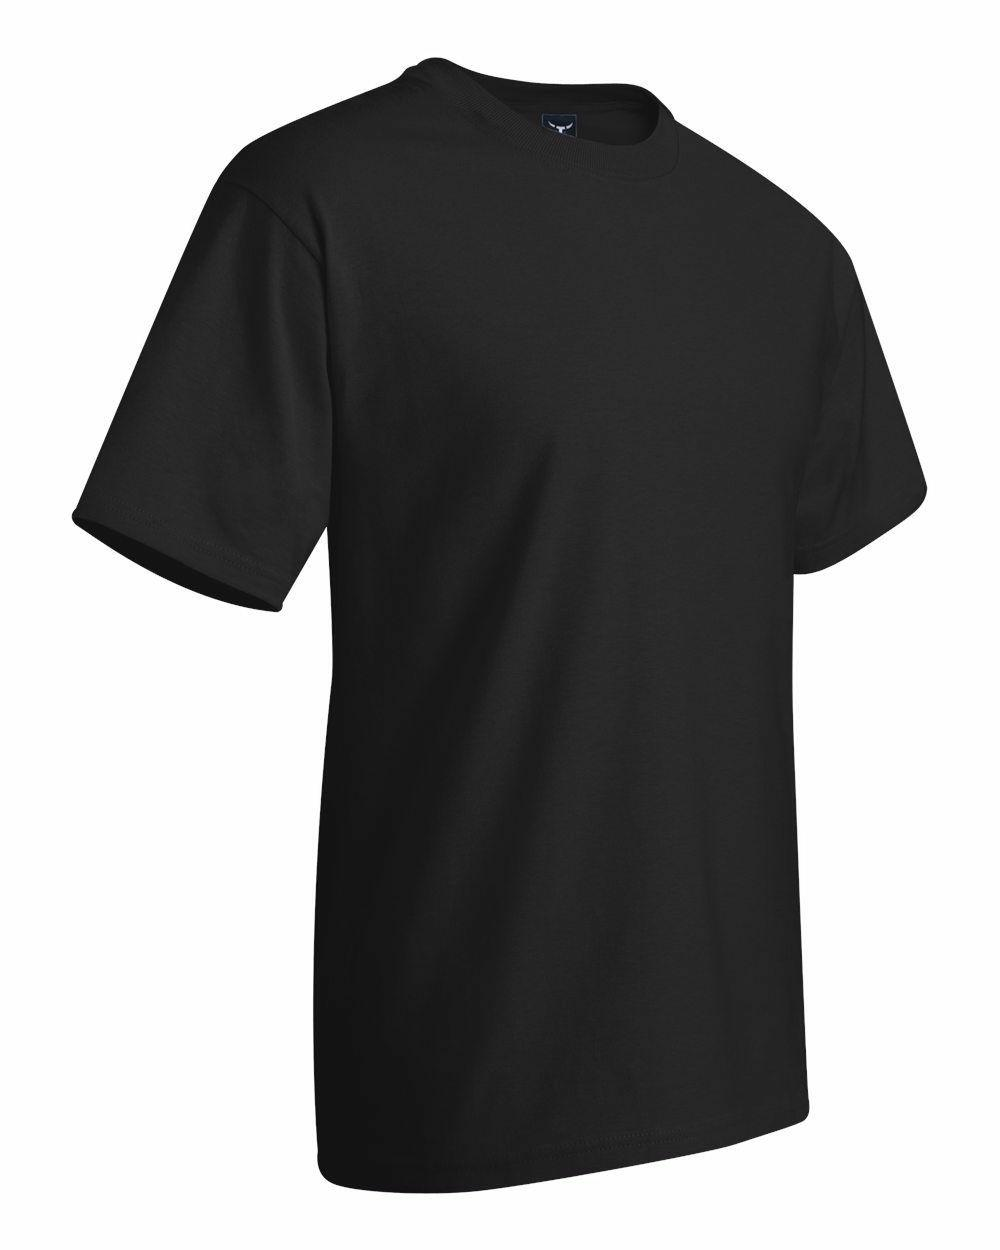 Hanes Cotton Crew Neck Adult T-Shirt 5180